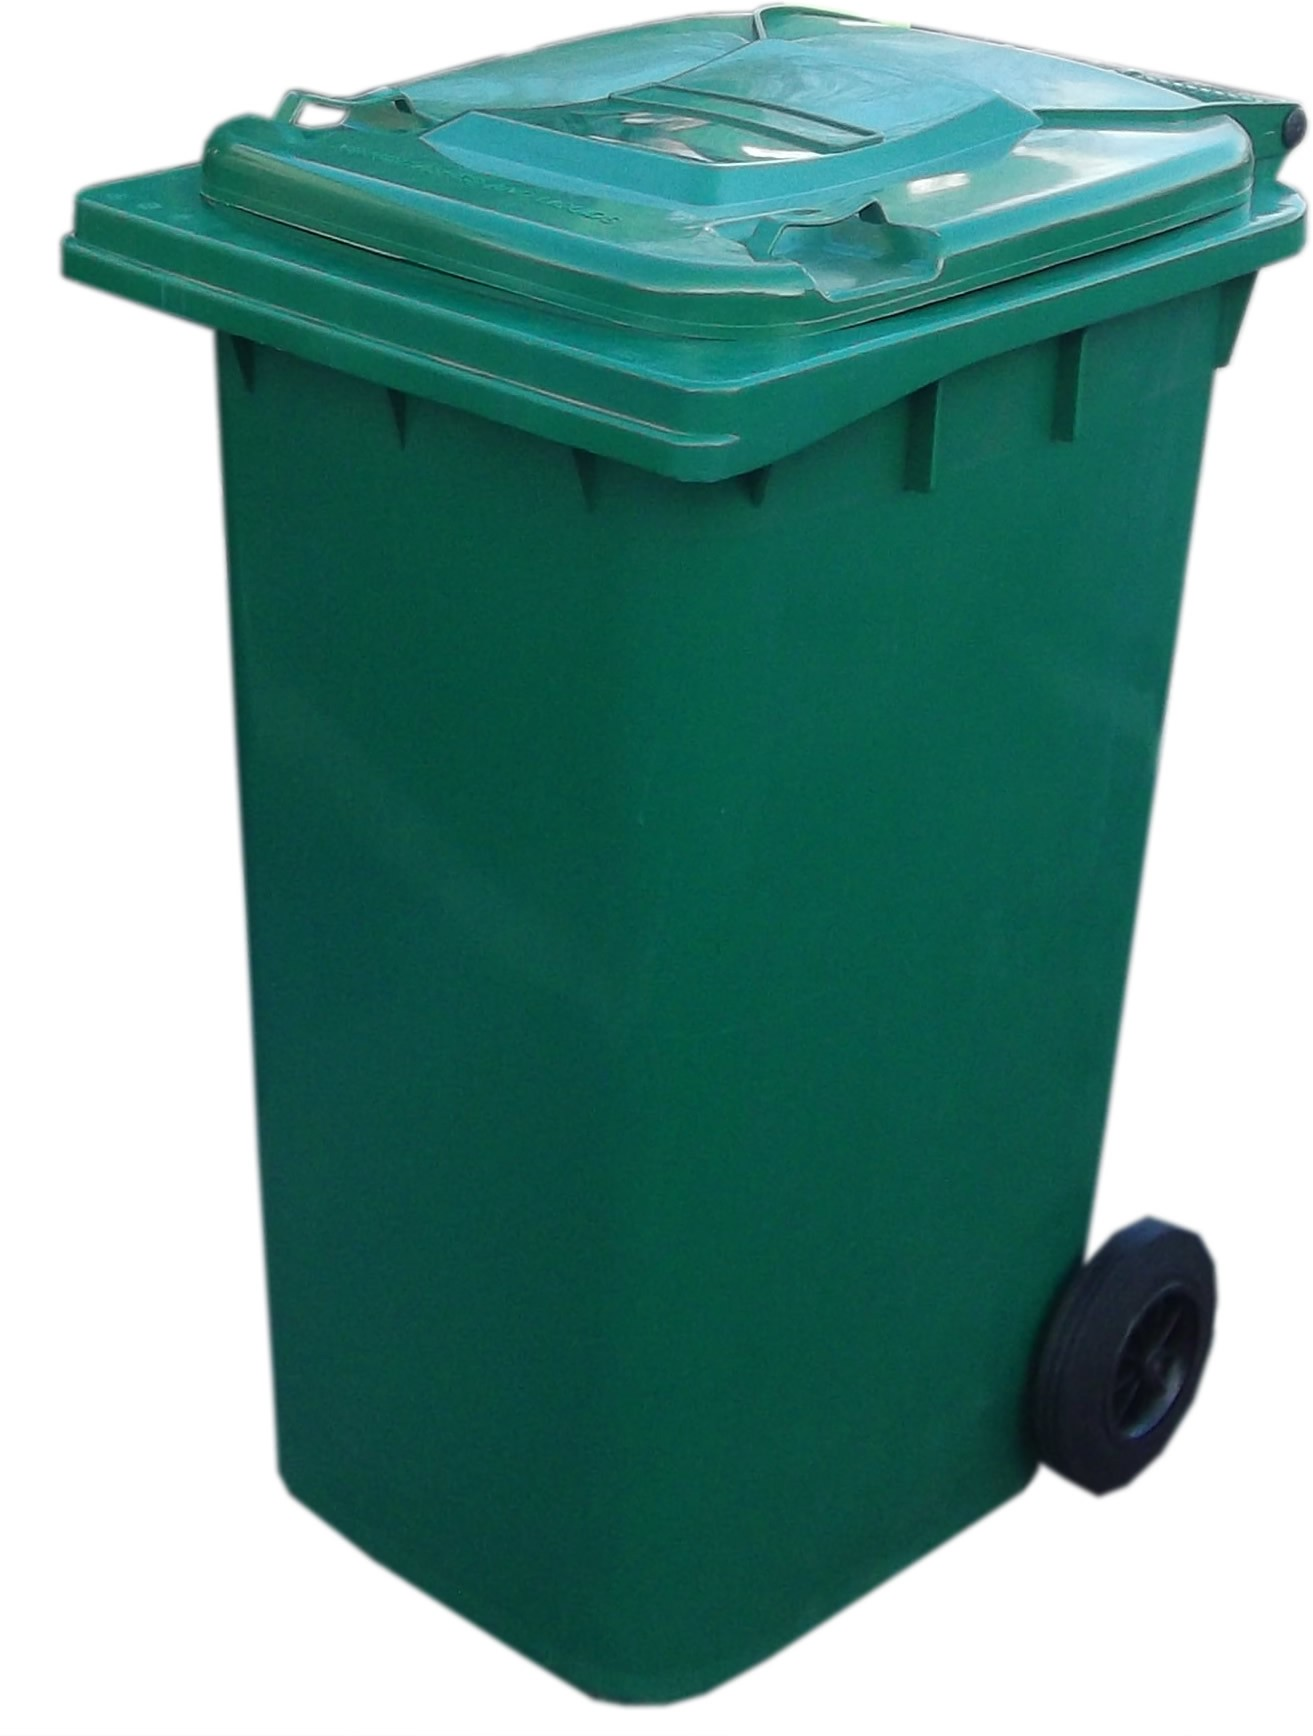 Green Recycling Bin Clipart.